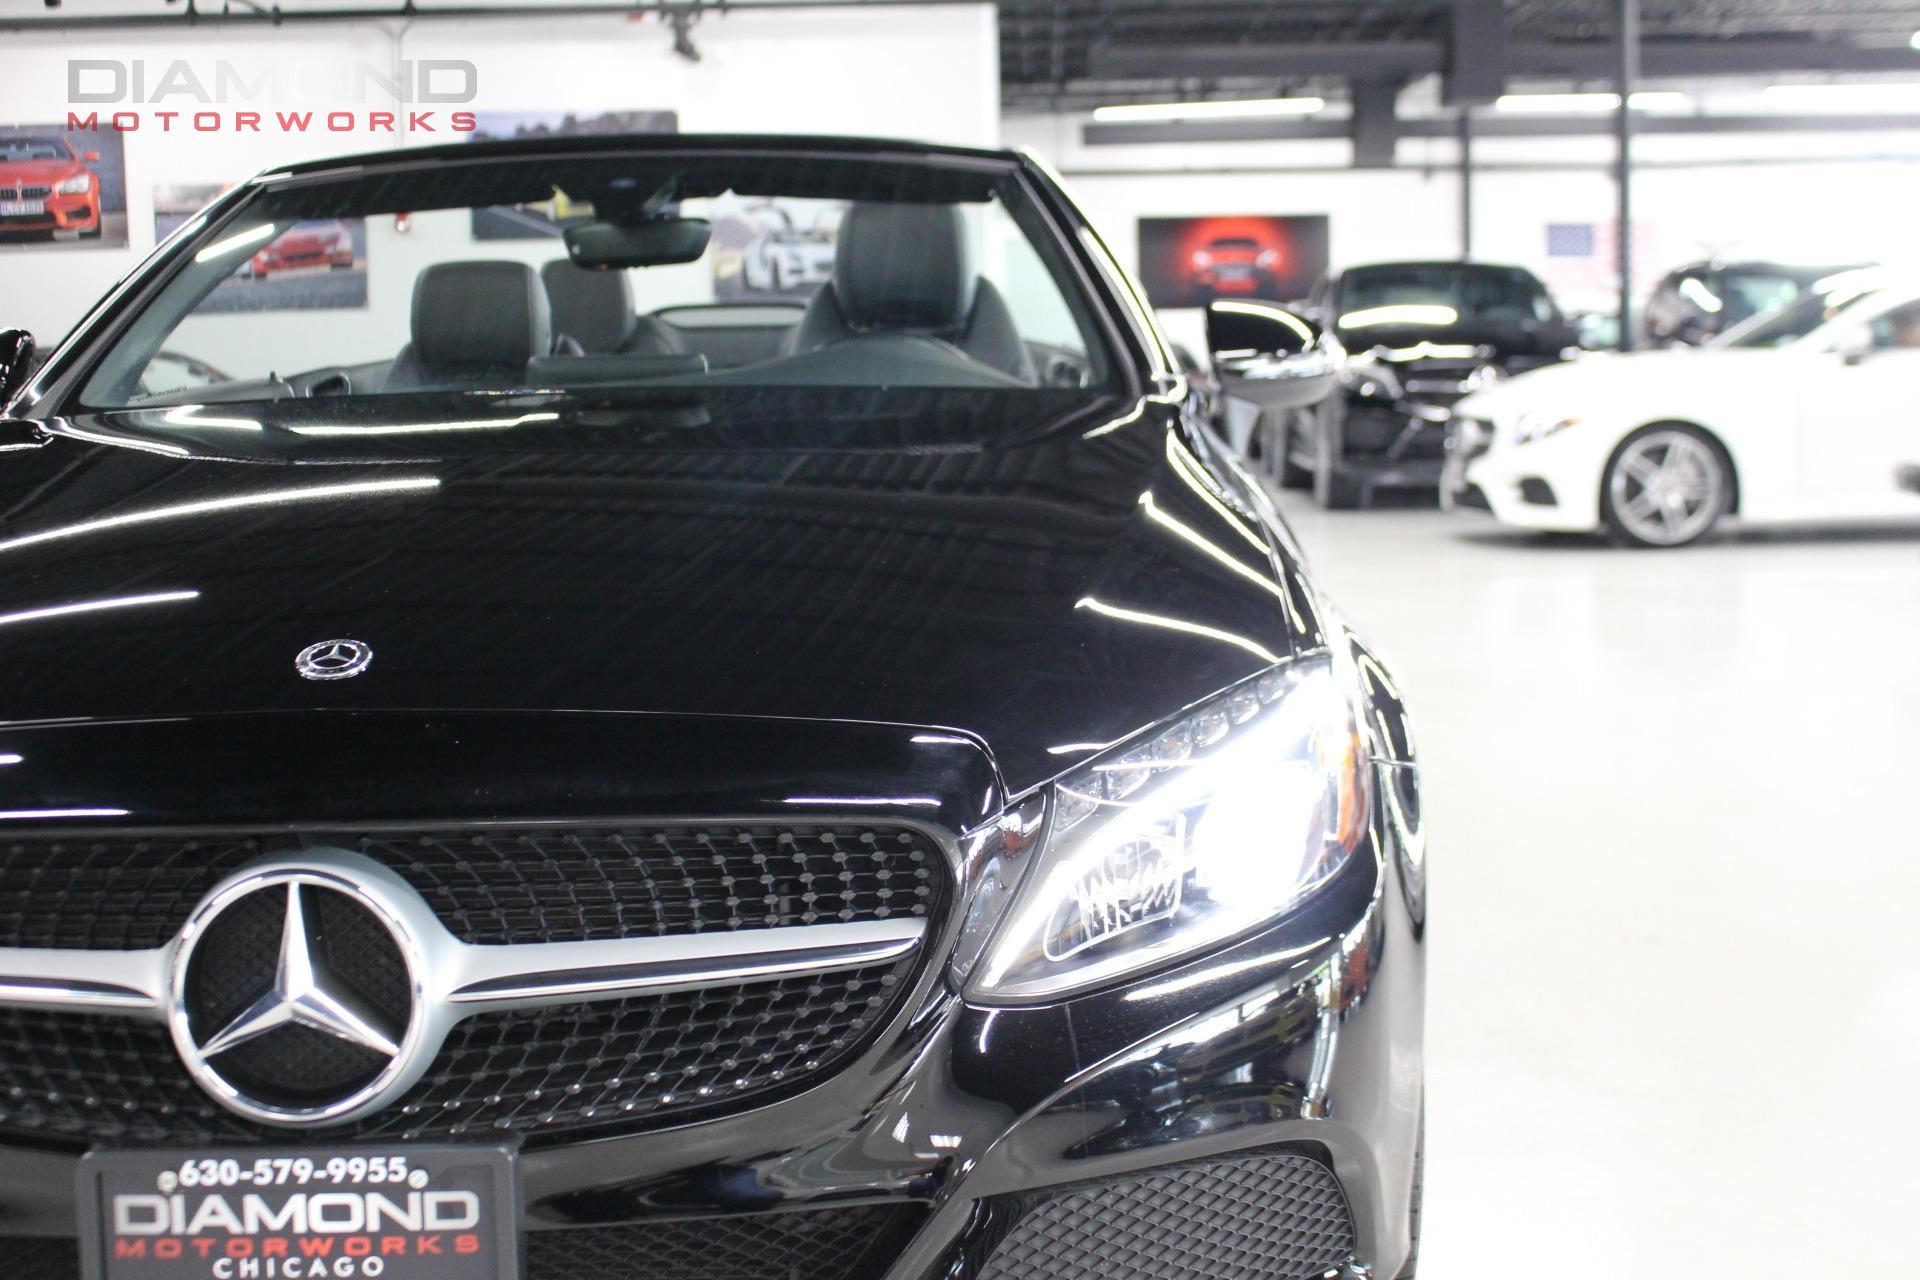 Used-2018-Mercedes-Benz-C-Class-C-300-4MATIC